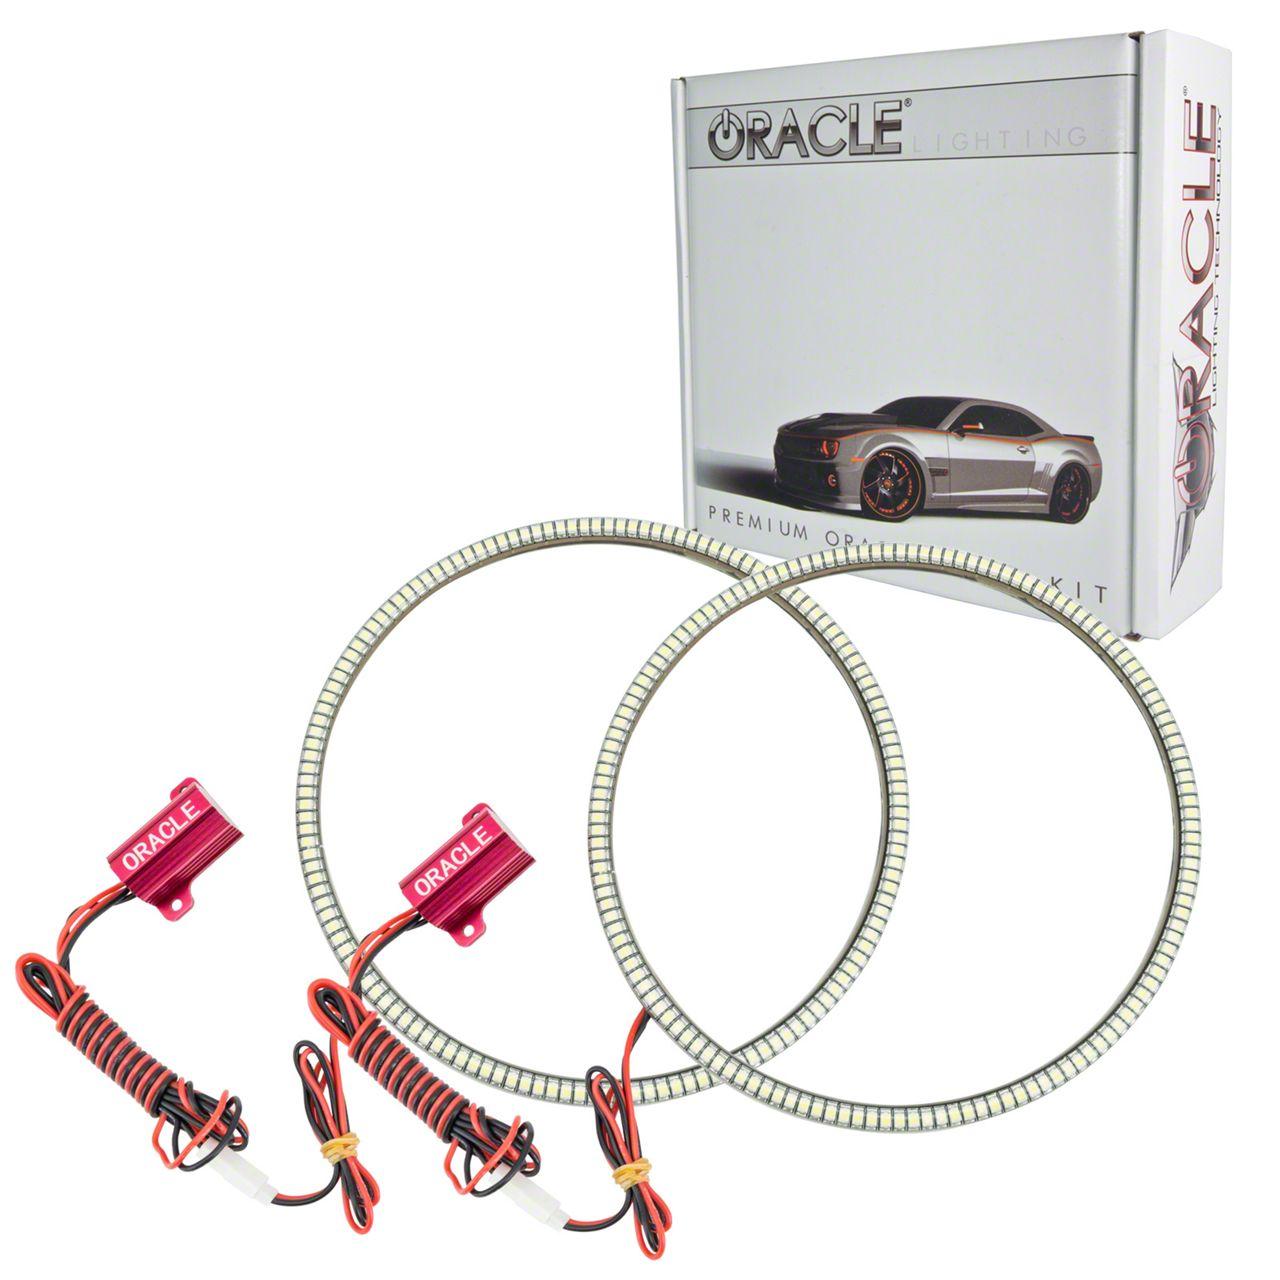 Oracle LED Waterproof Headlight Halo Conversion Kit - Red (07-18 Jeep Wrangler JK)